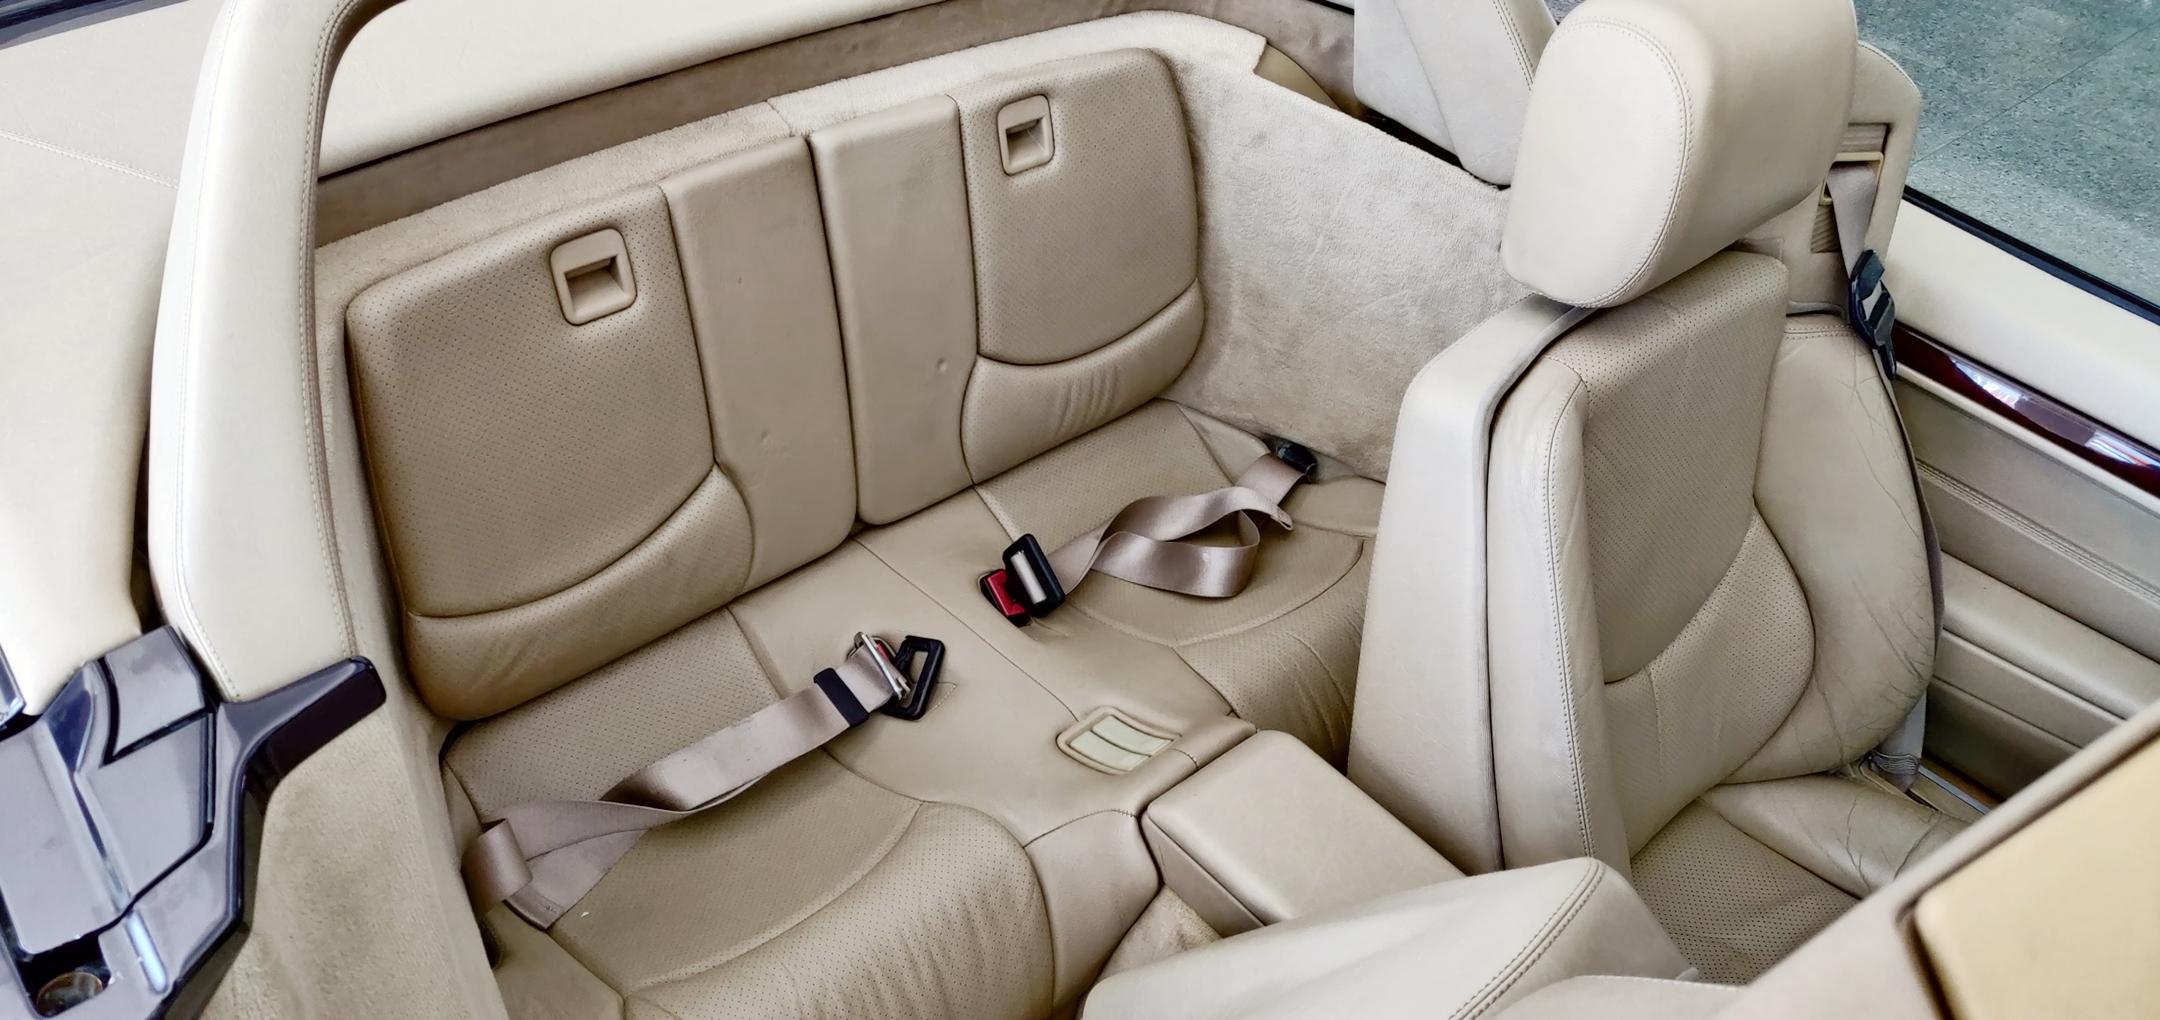 Mercedes-Benz SL 320  | Imagem 11